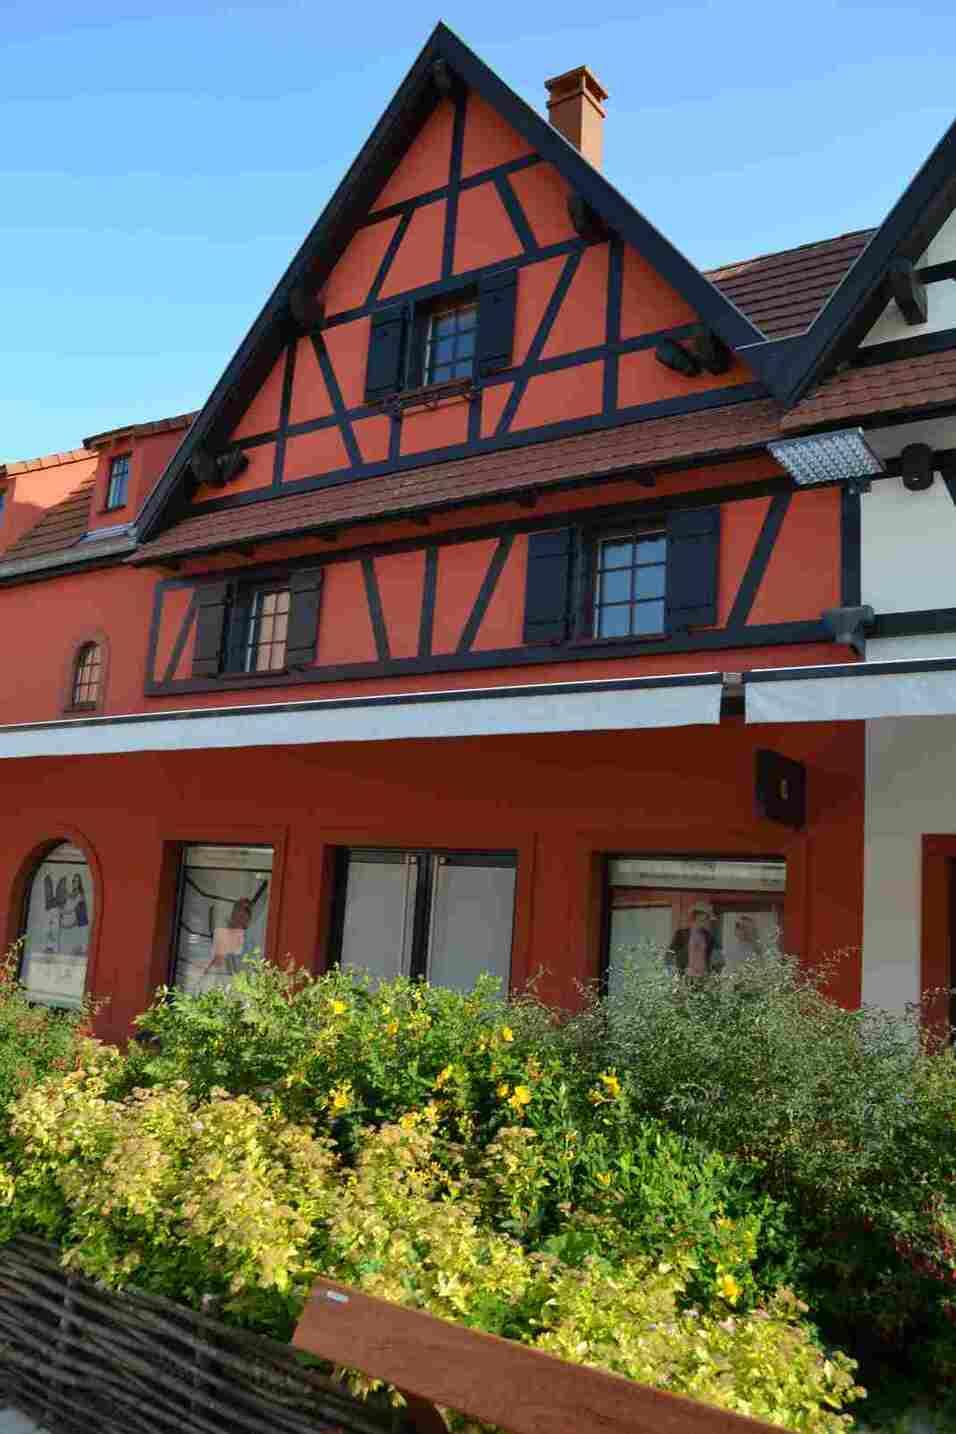 Roppenheim (Alsace)